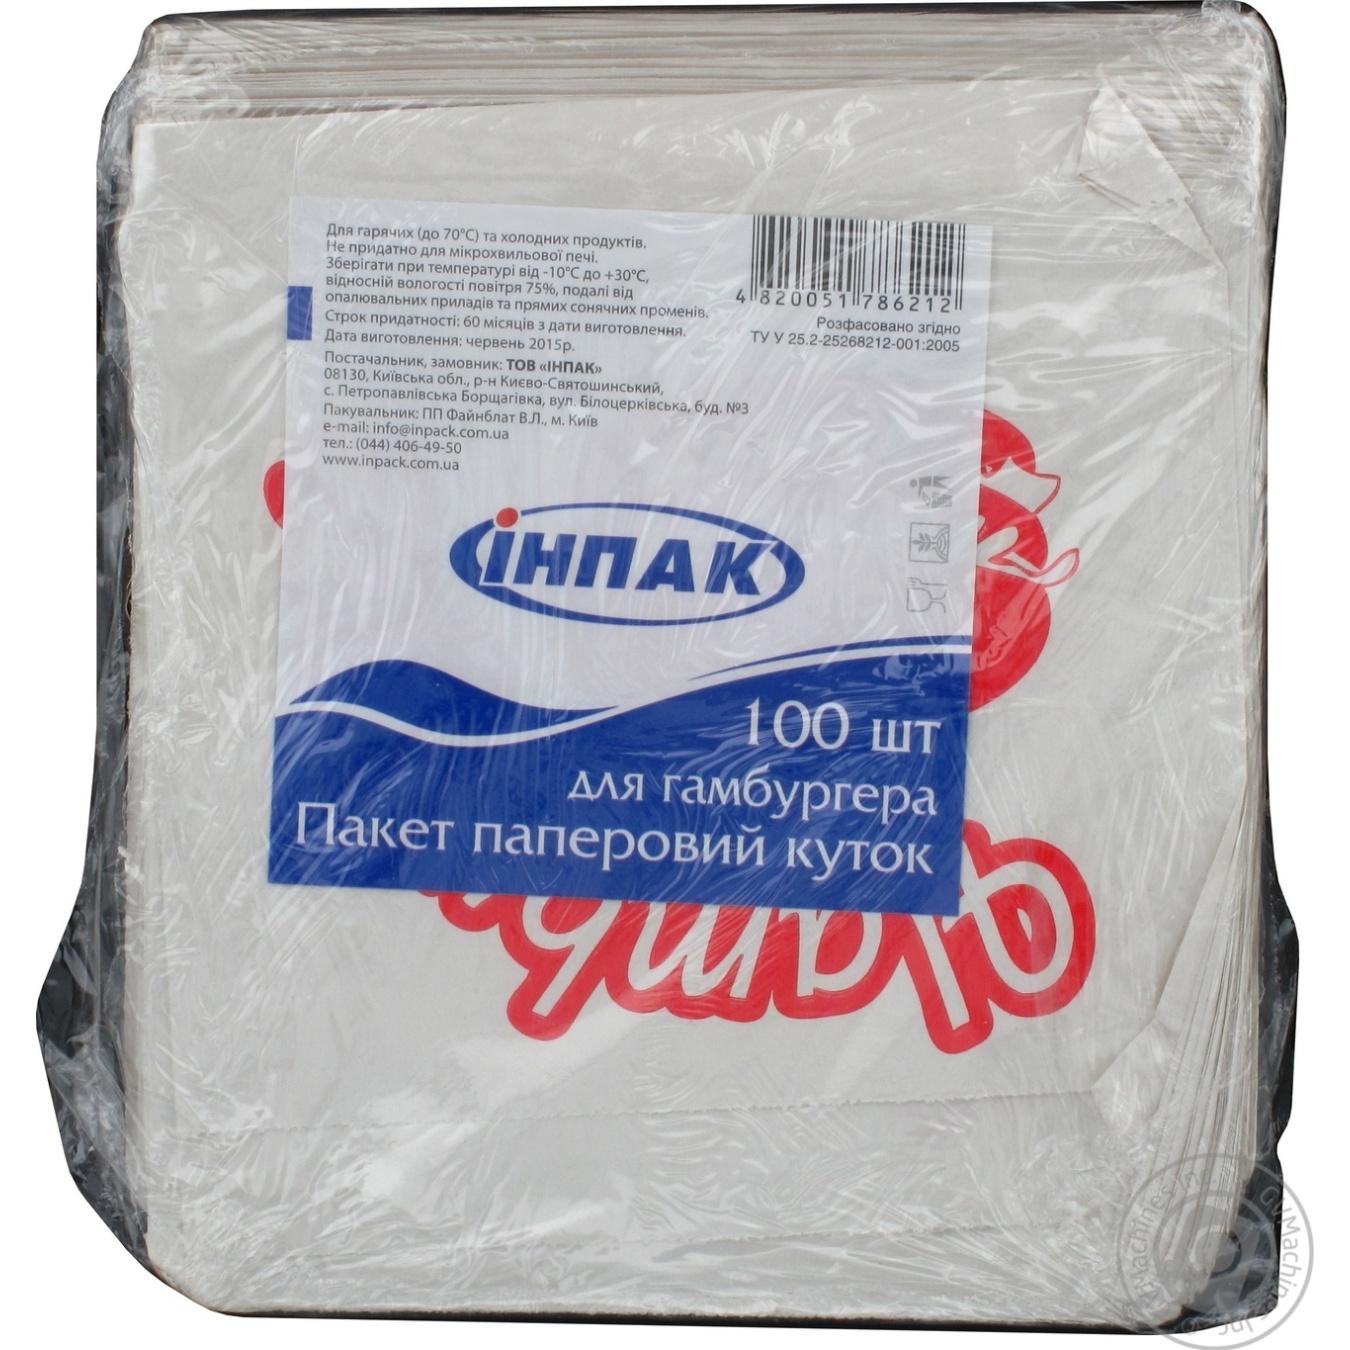 Пакет Инпак уголок бумажный для гамбургера 1уп.х100шт